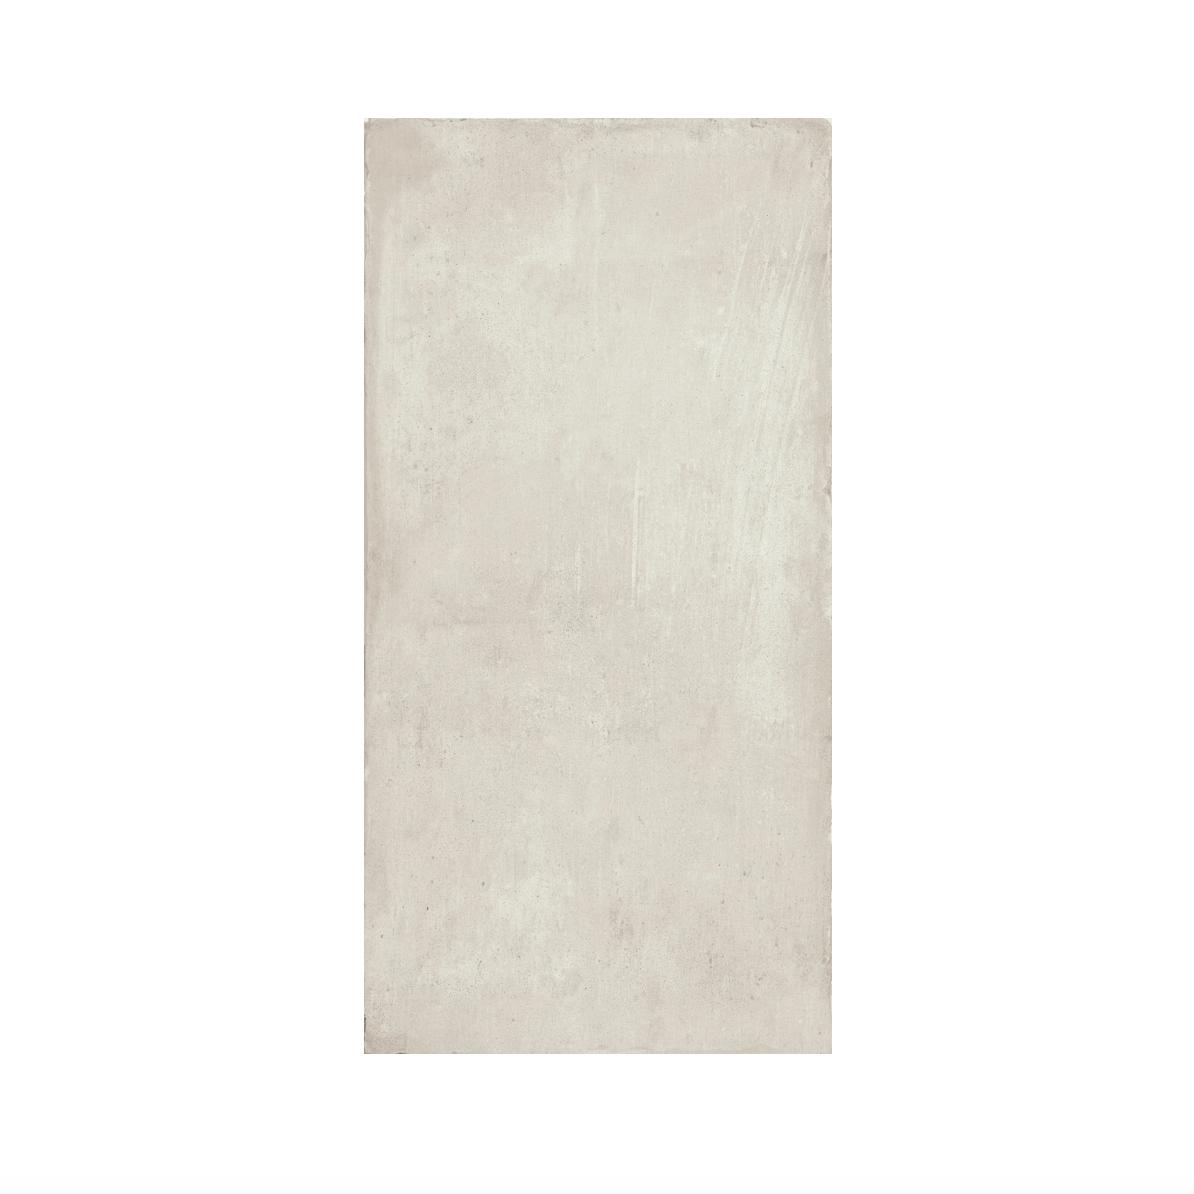 Iris Desire White Rectangular Floor Tile